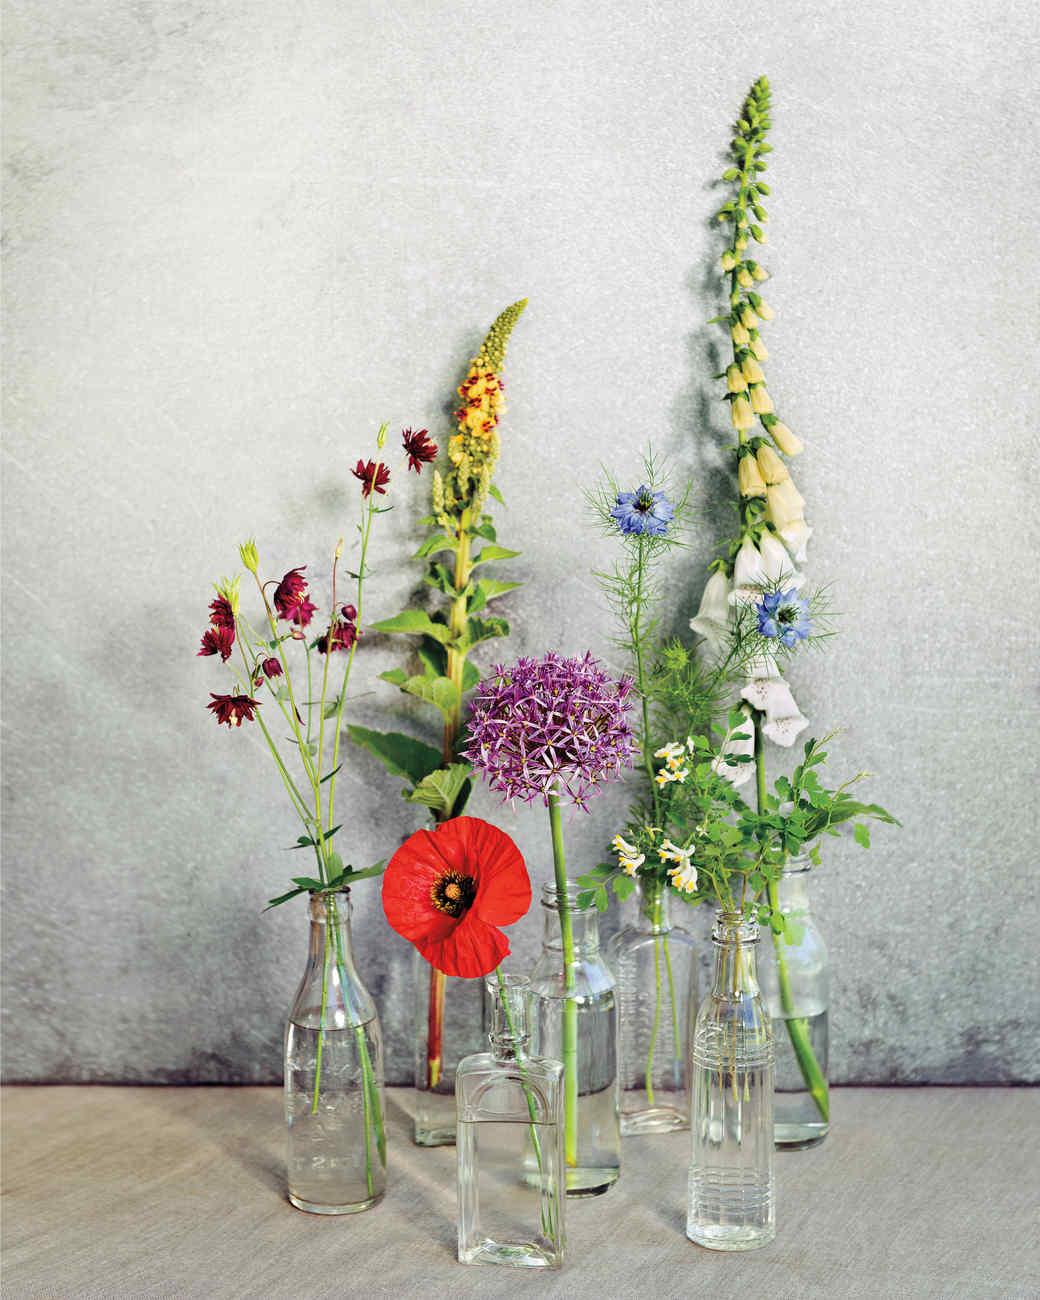 page-dickey-garden-flowers-md110307-139.jpg